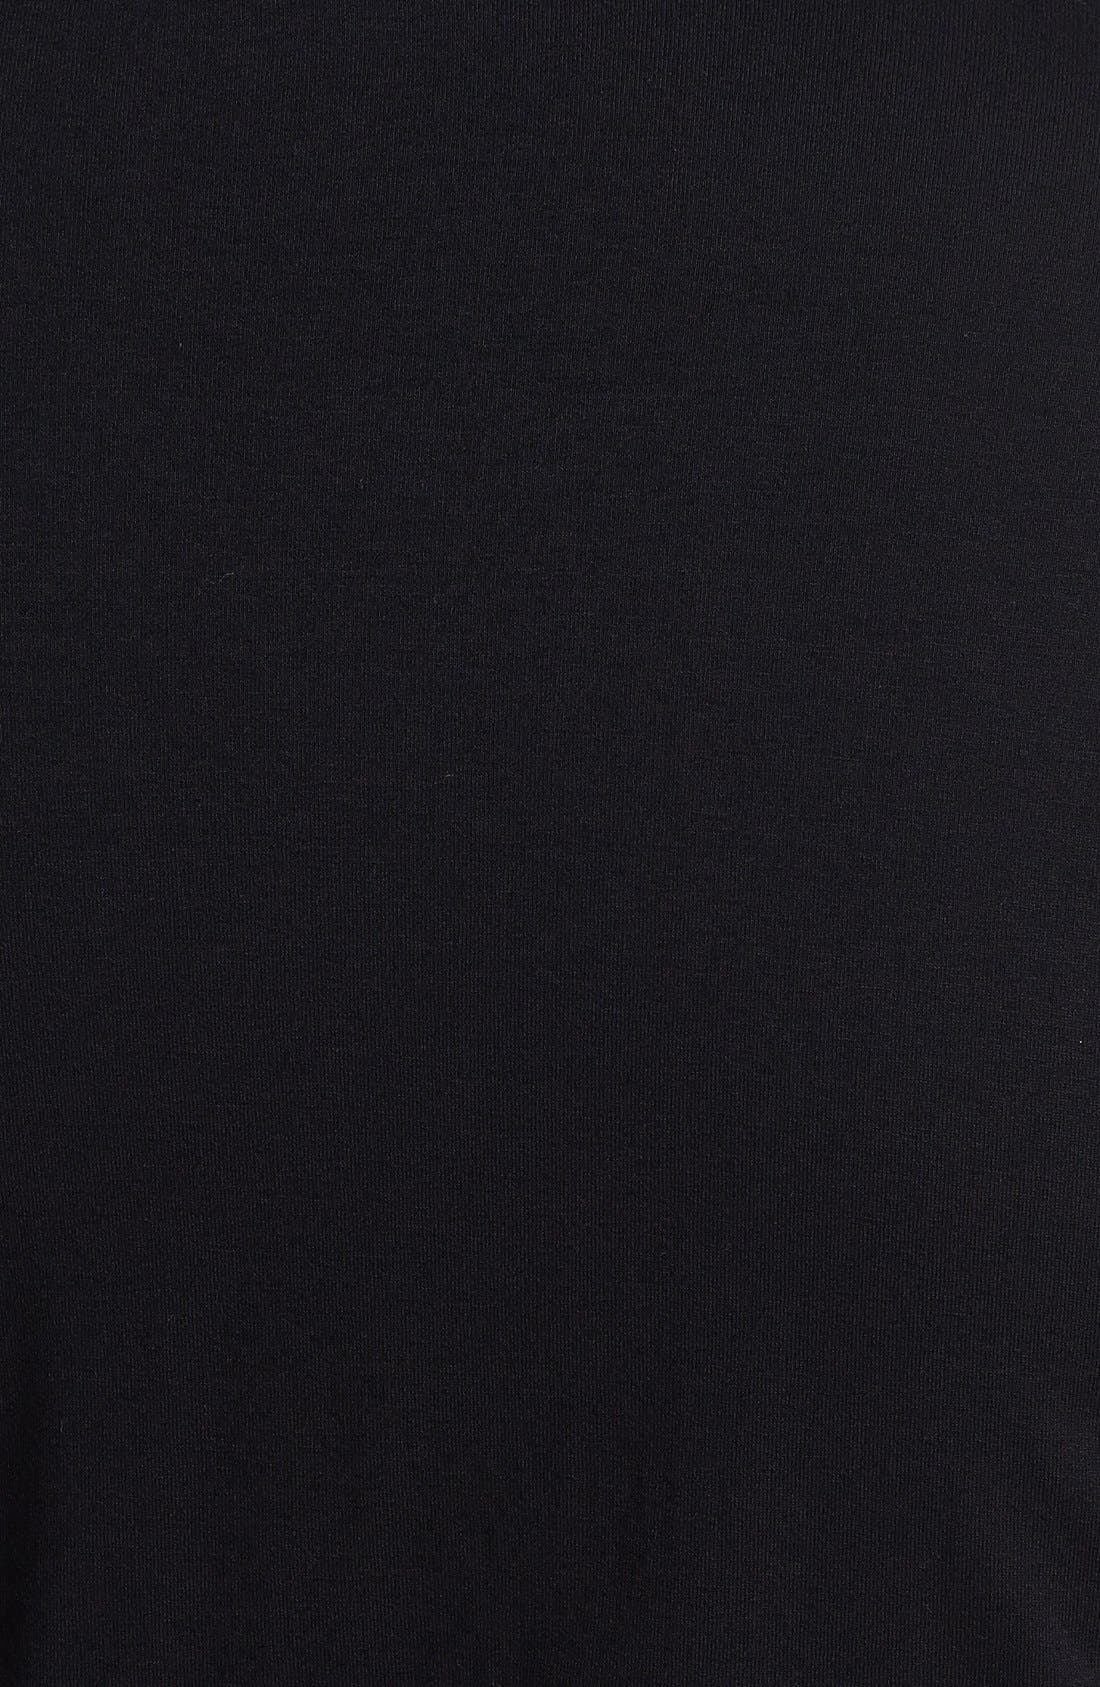 Alternate Image 3  - Vince Camuto Jersey Wrap Top (Plus Size)